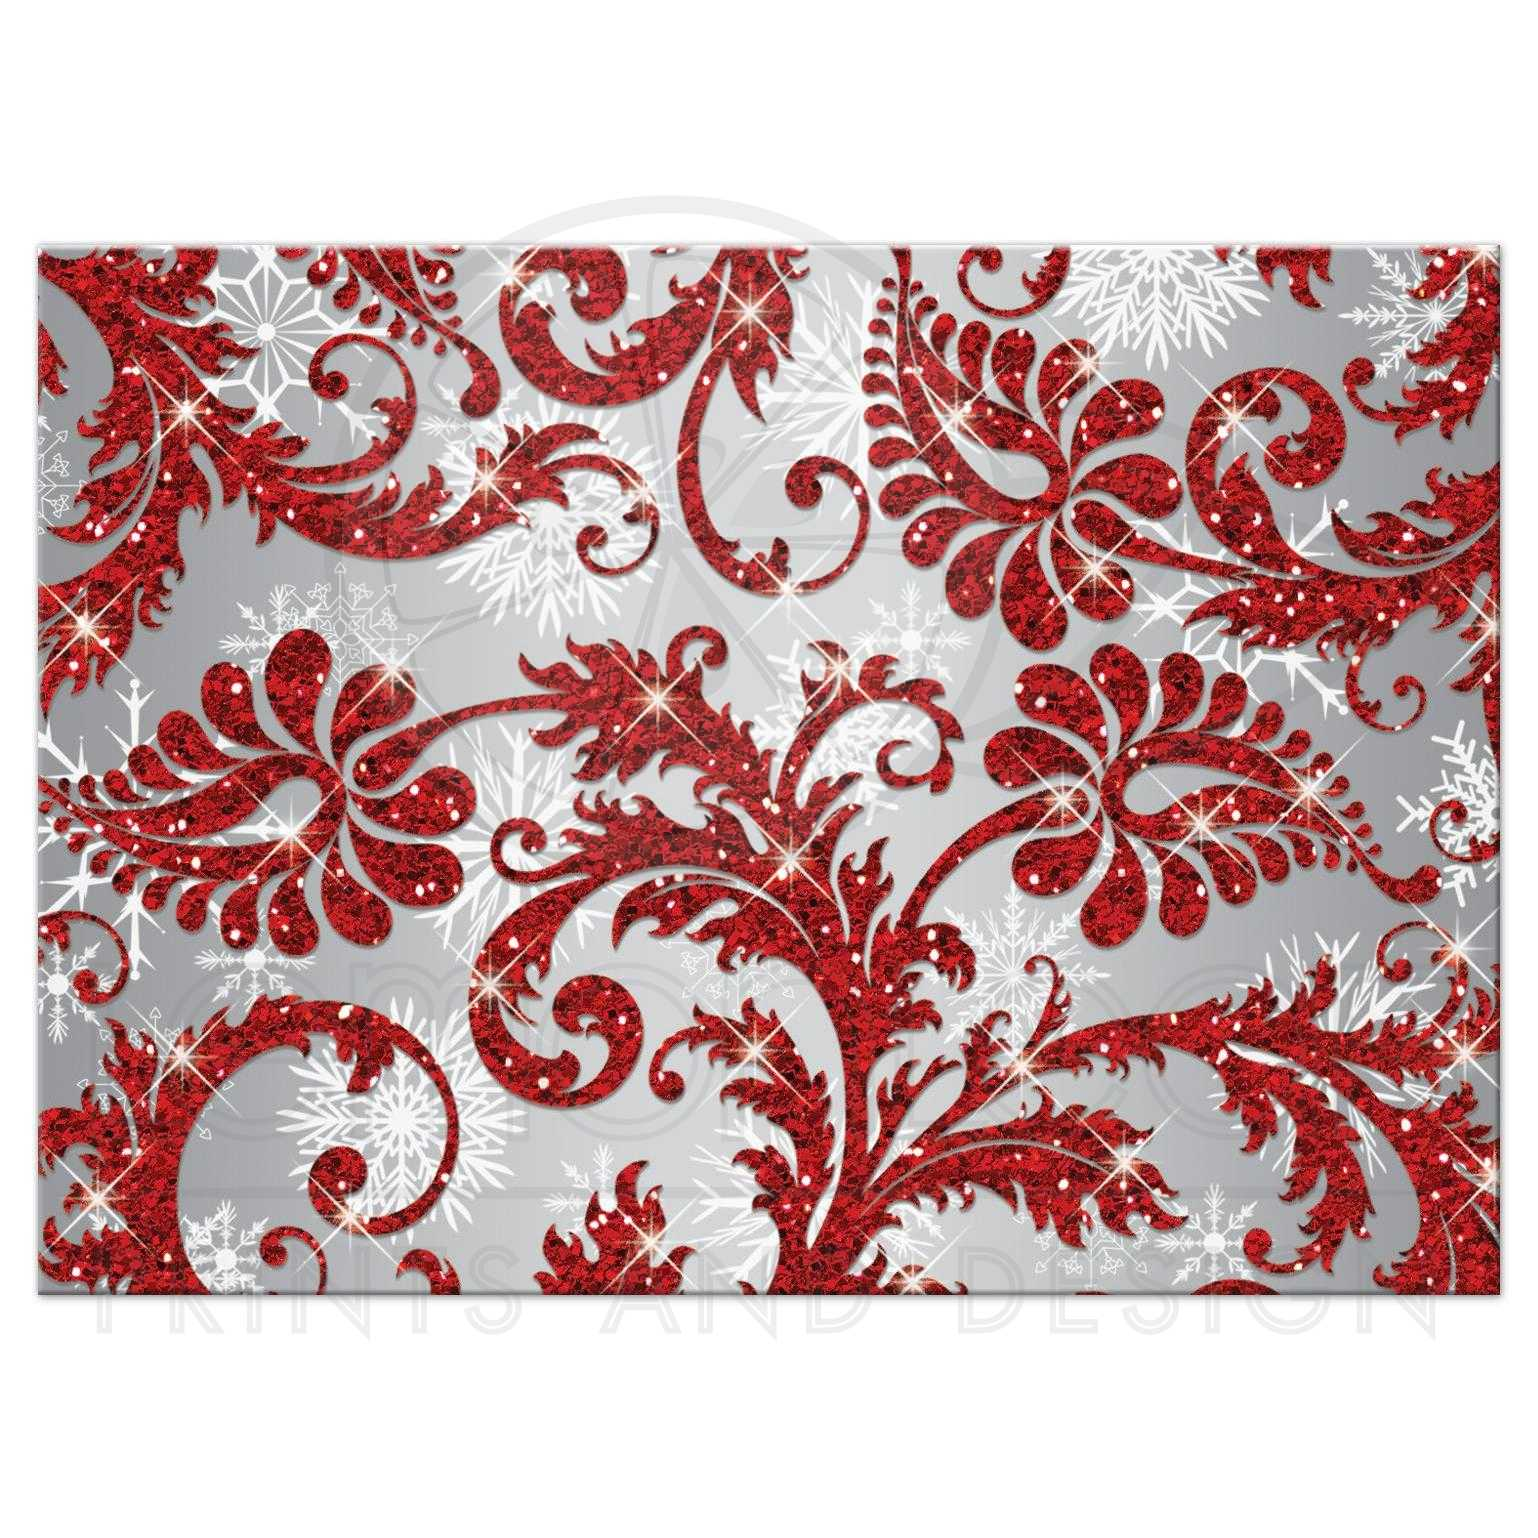 Wedding Reponse Card | Red Winter Wonderland | Silver, White ...